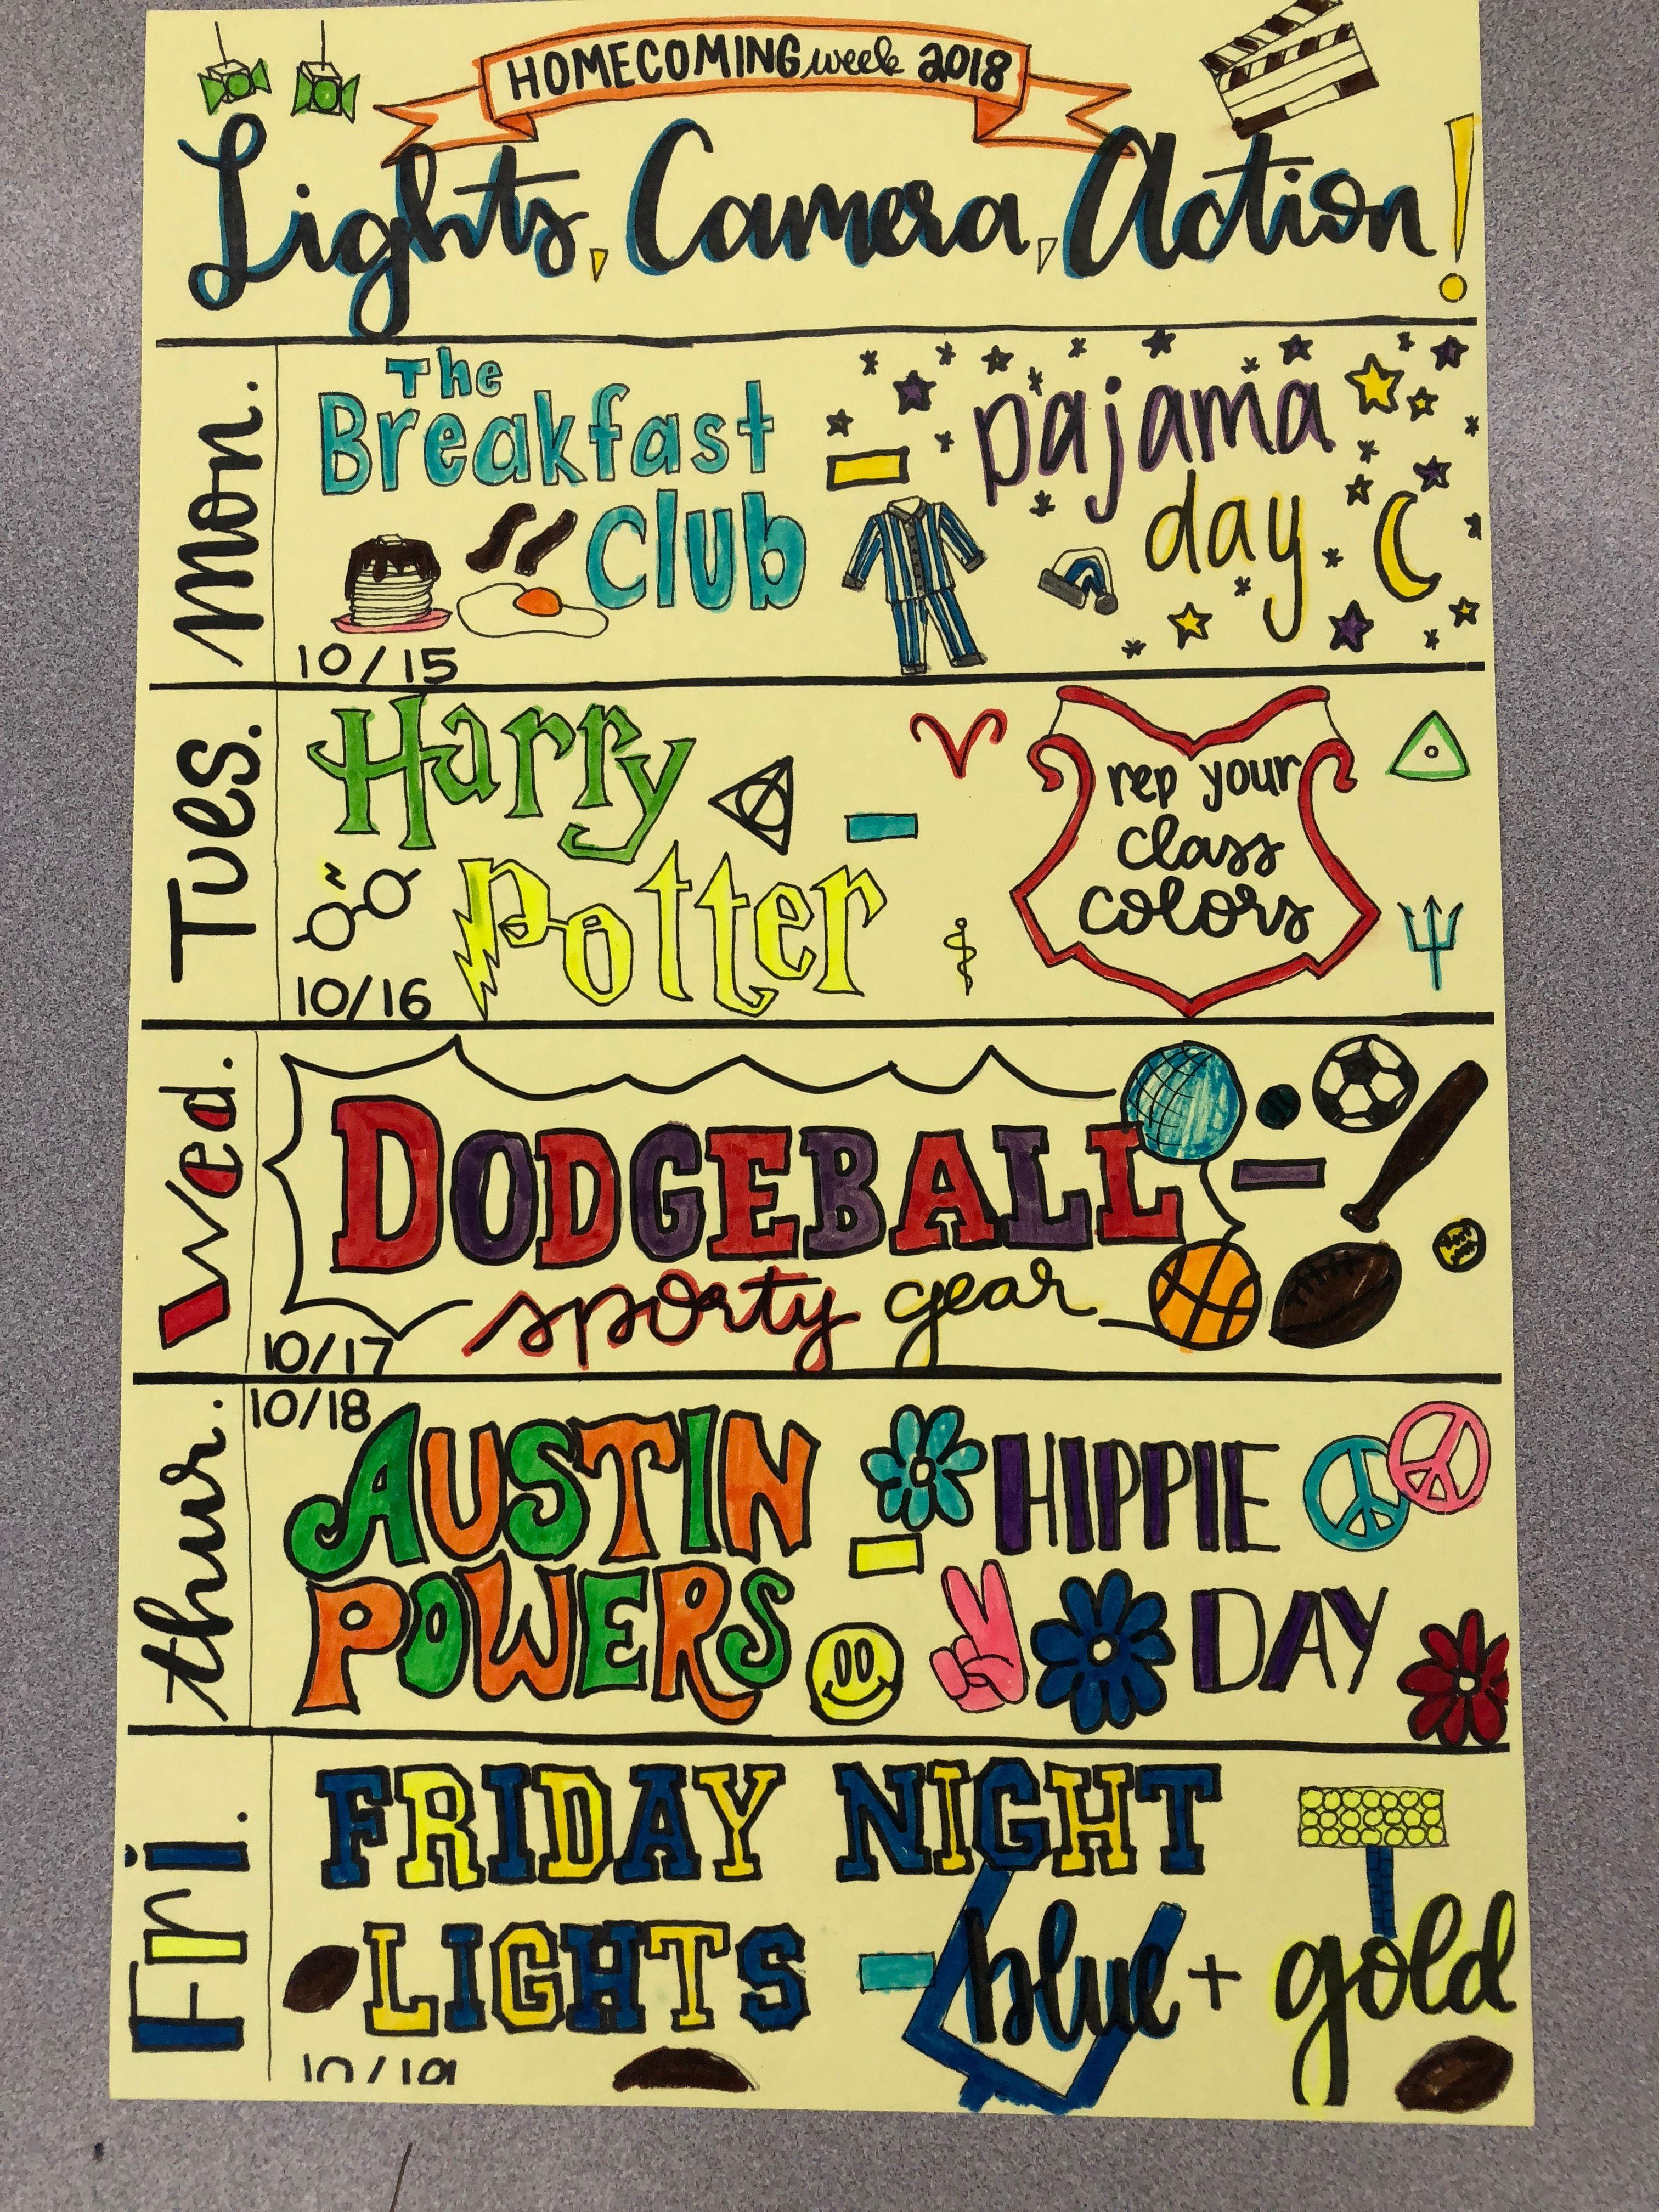 Aghs Flyer For Homecoming 2018 Celebrating Movie Genres School Spirit Week School Spirit Ideas Pep Rally School Spirit Days